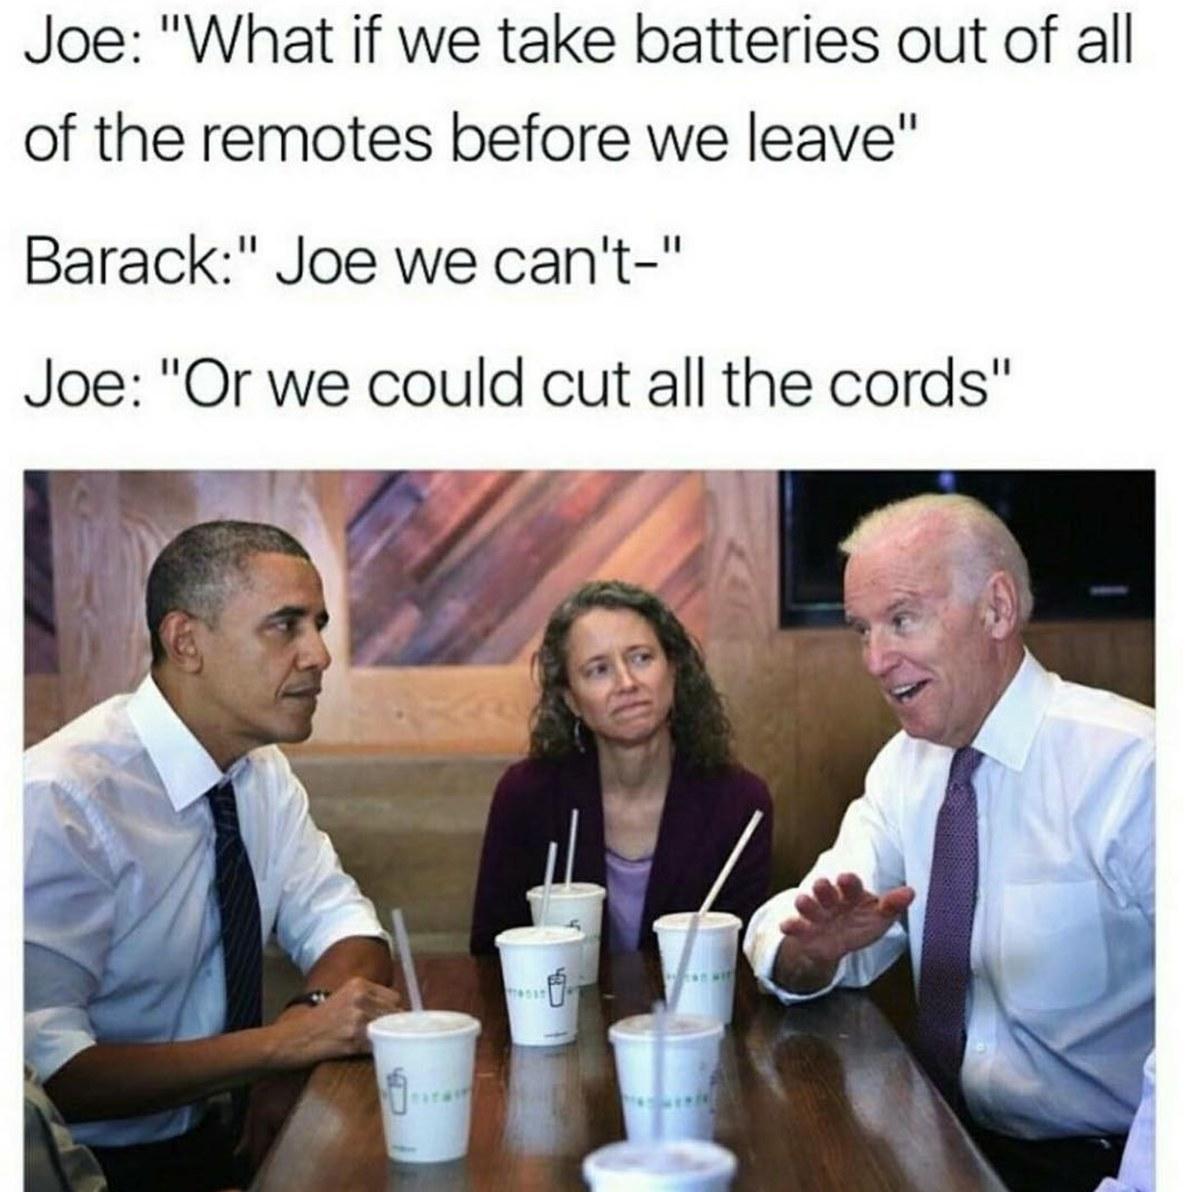 sub buzz 12327 1478980666 1?downsize=715 *&output format=auto&output quality=auto 12 more joebama memes to get you through trump presidency